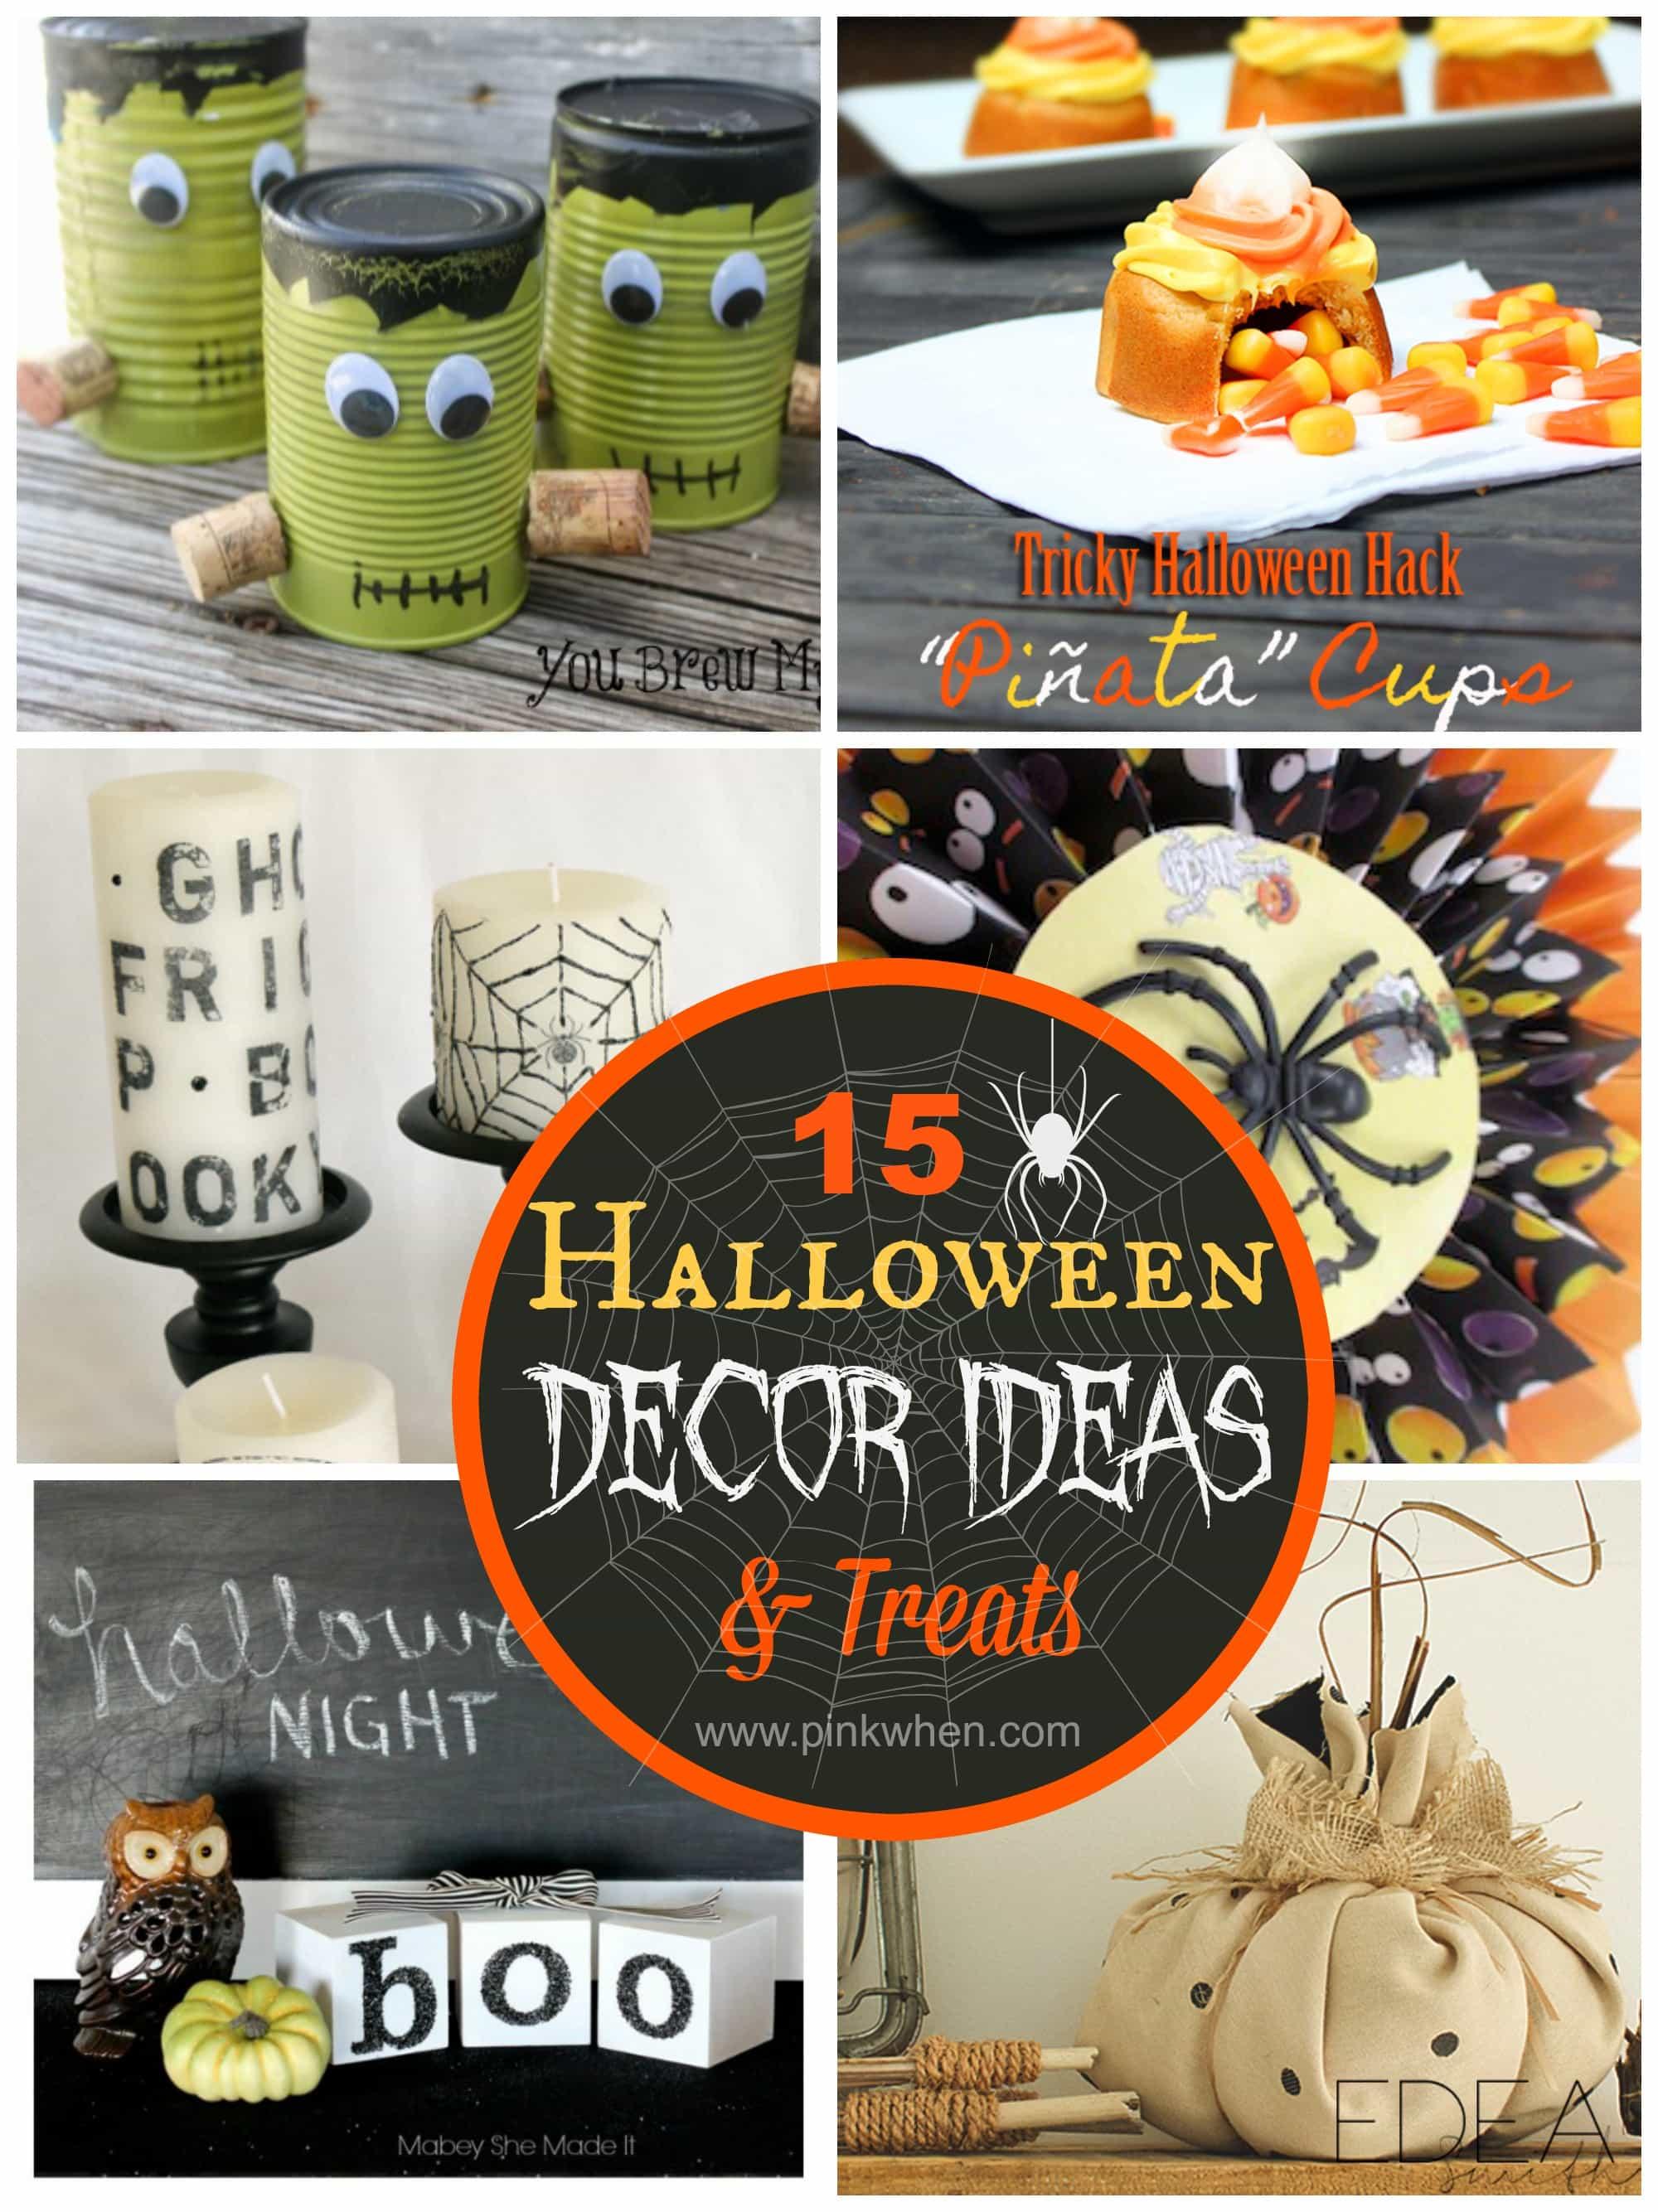 15 Halloween Decor Ideas and Halloween Treats via PinkWhen.com